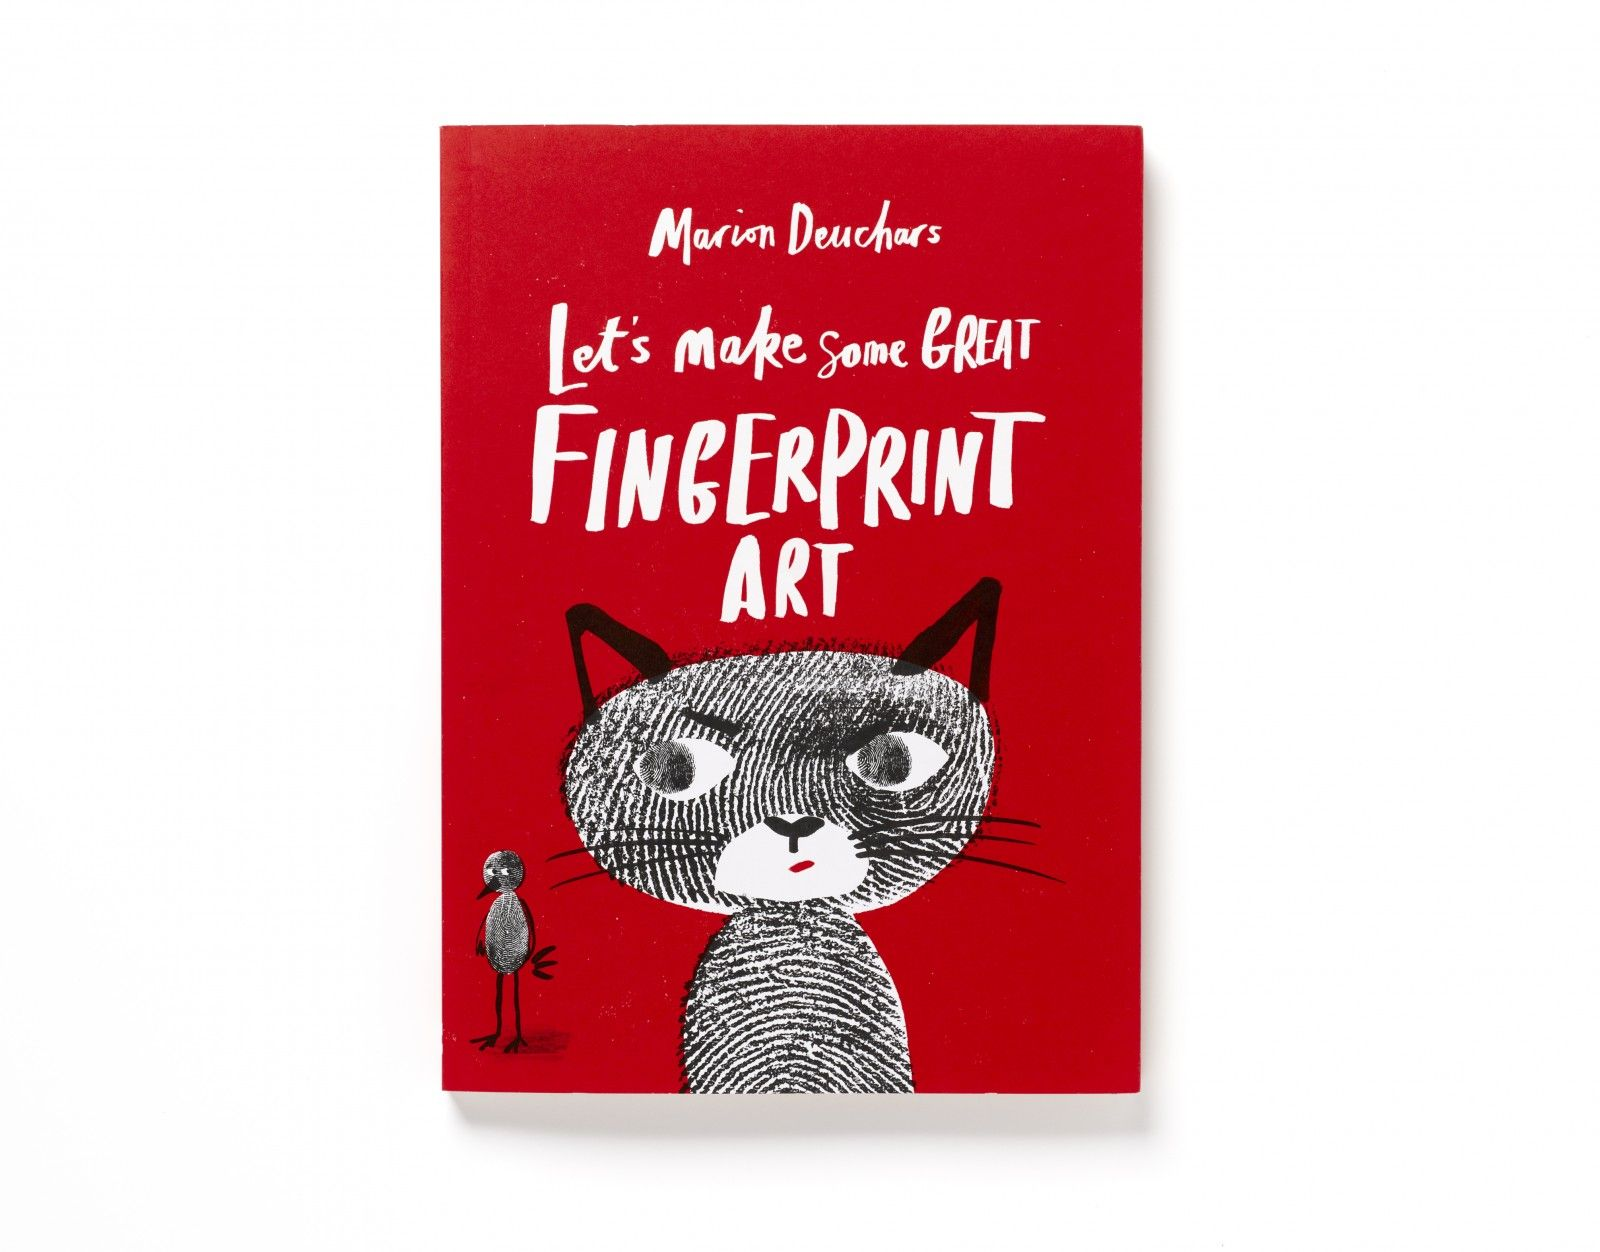 2013 / Book Design / Let's Make Some Great Fingerprint Art / Agency: Laurence King Publishing / Brand: Laurence King Publishing /